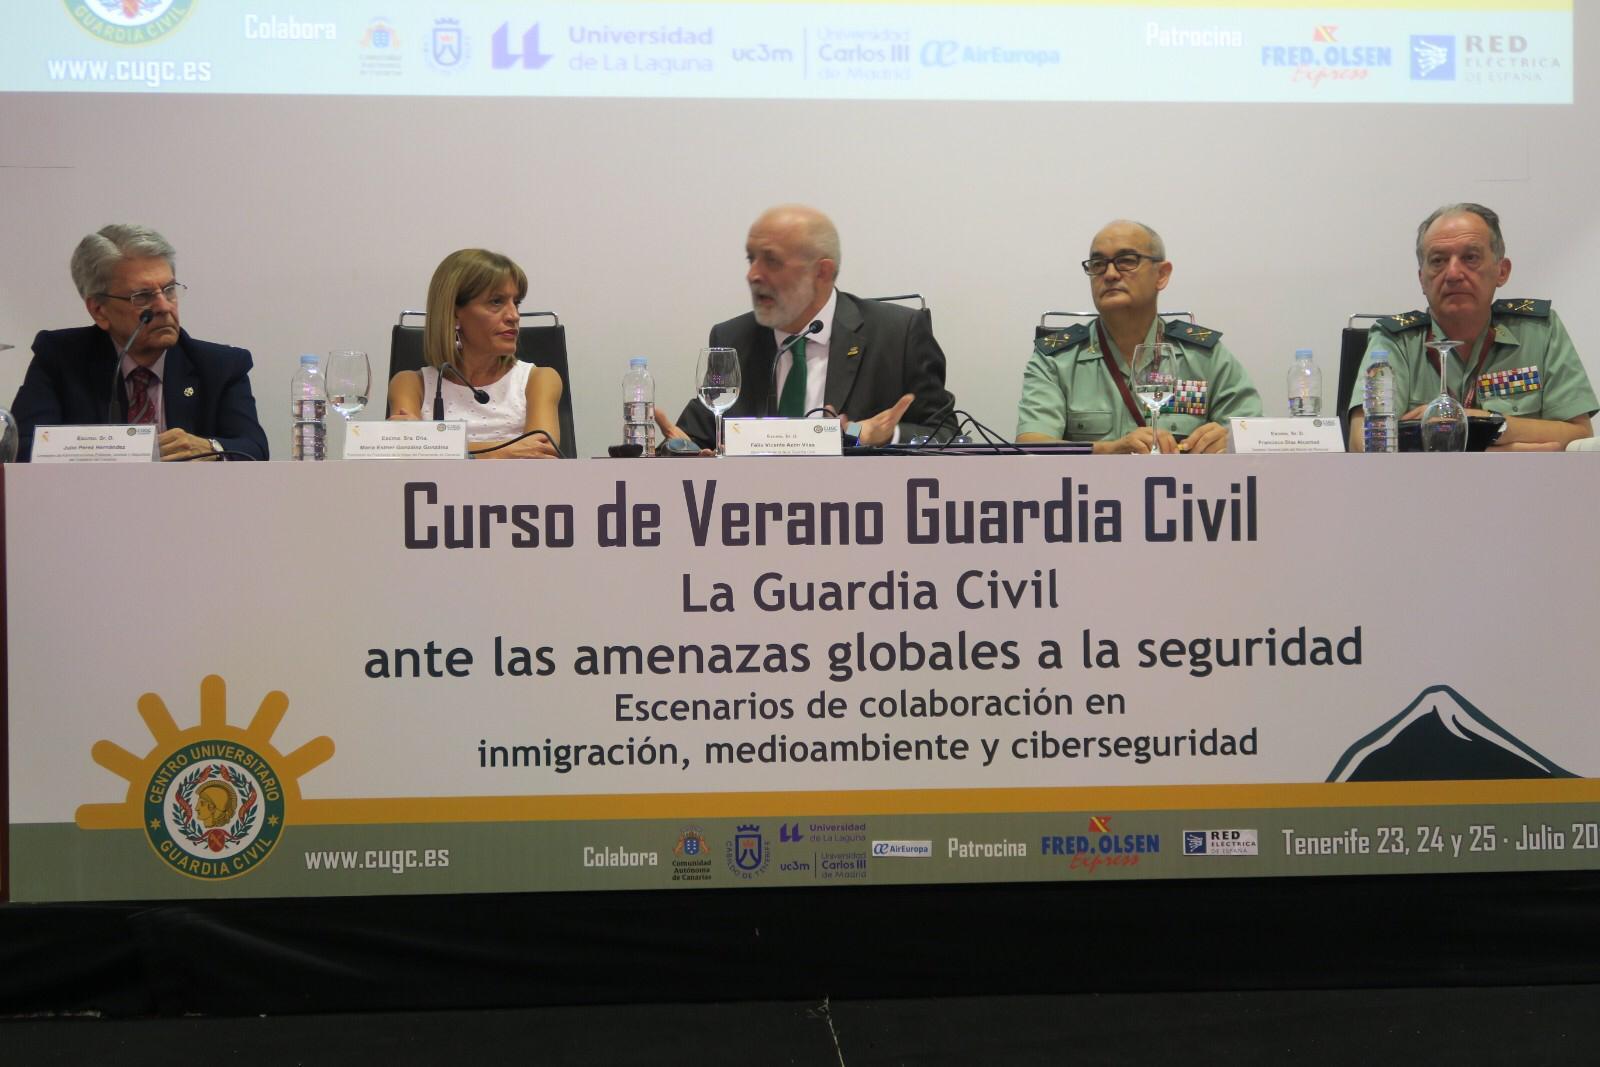 Julio Pérez inaugura en Tenerife un curso de verano de la Guardia Civil